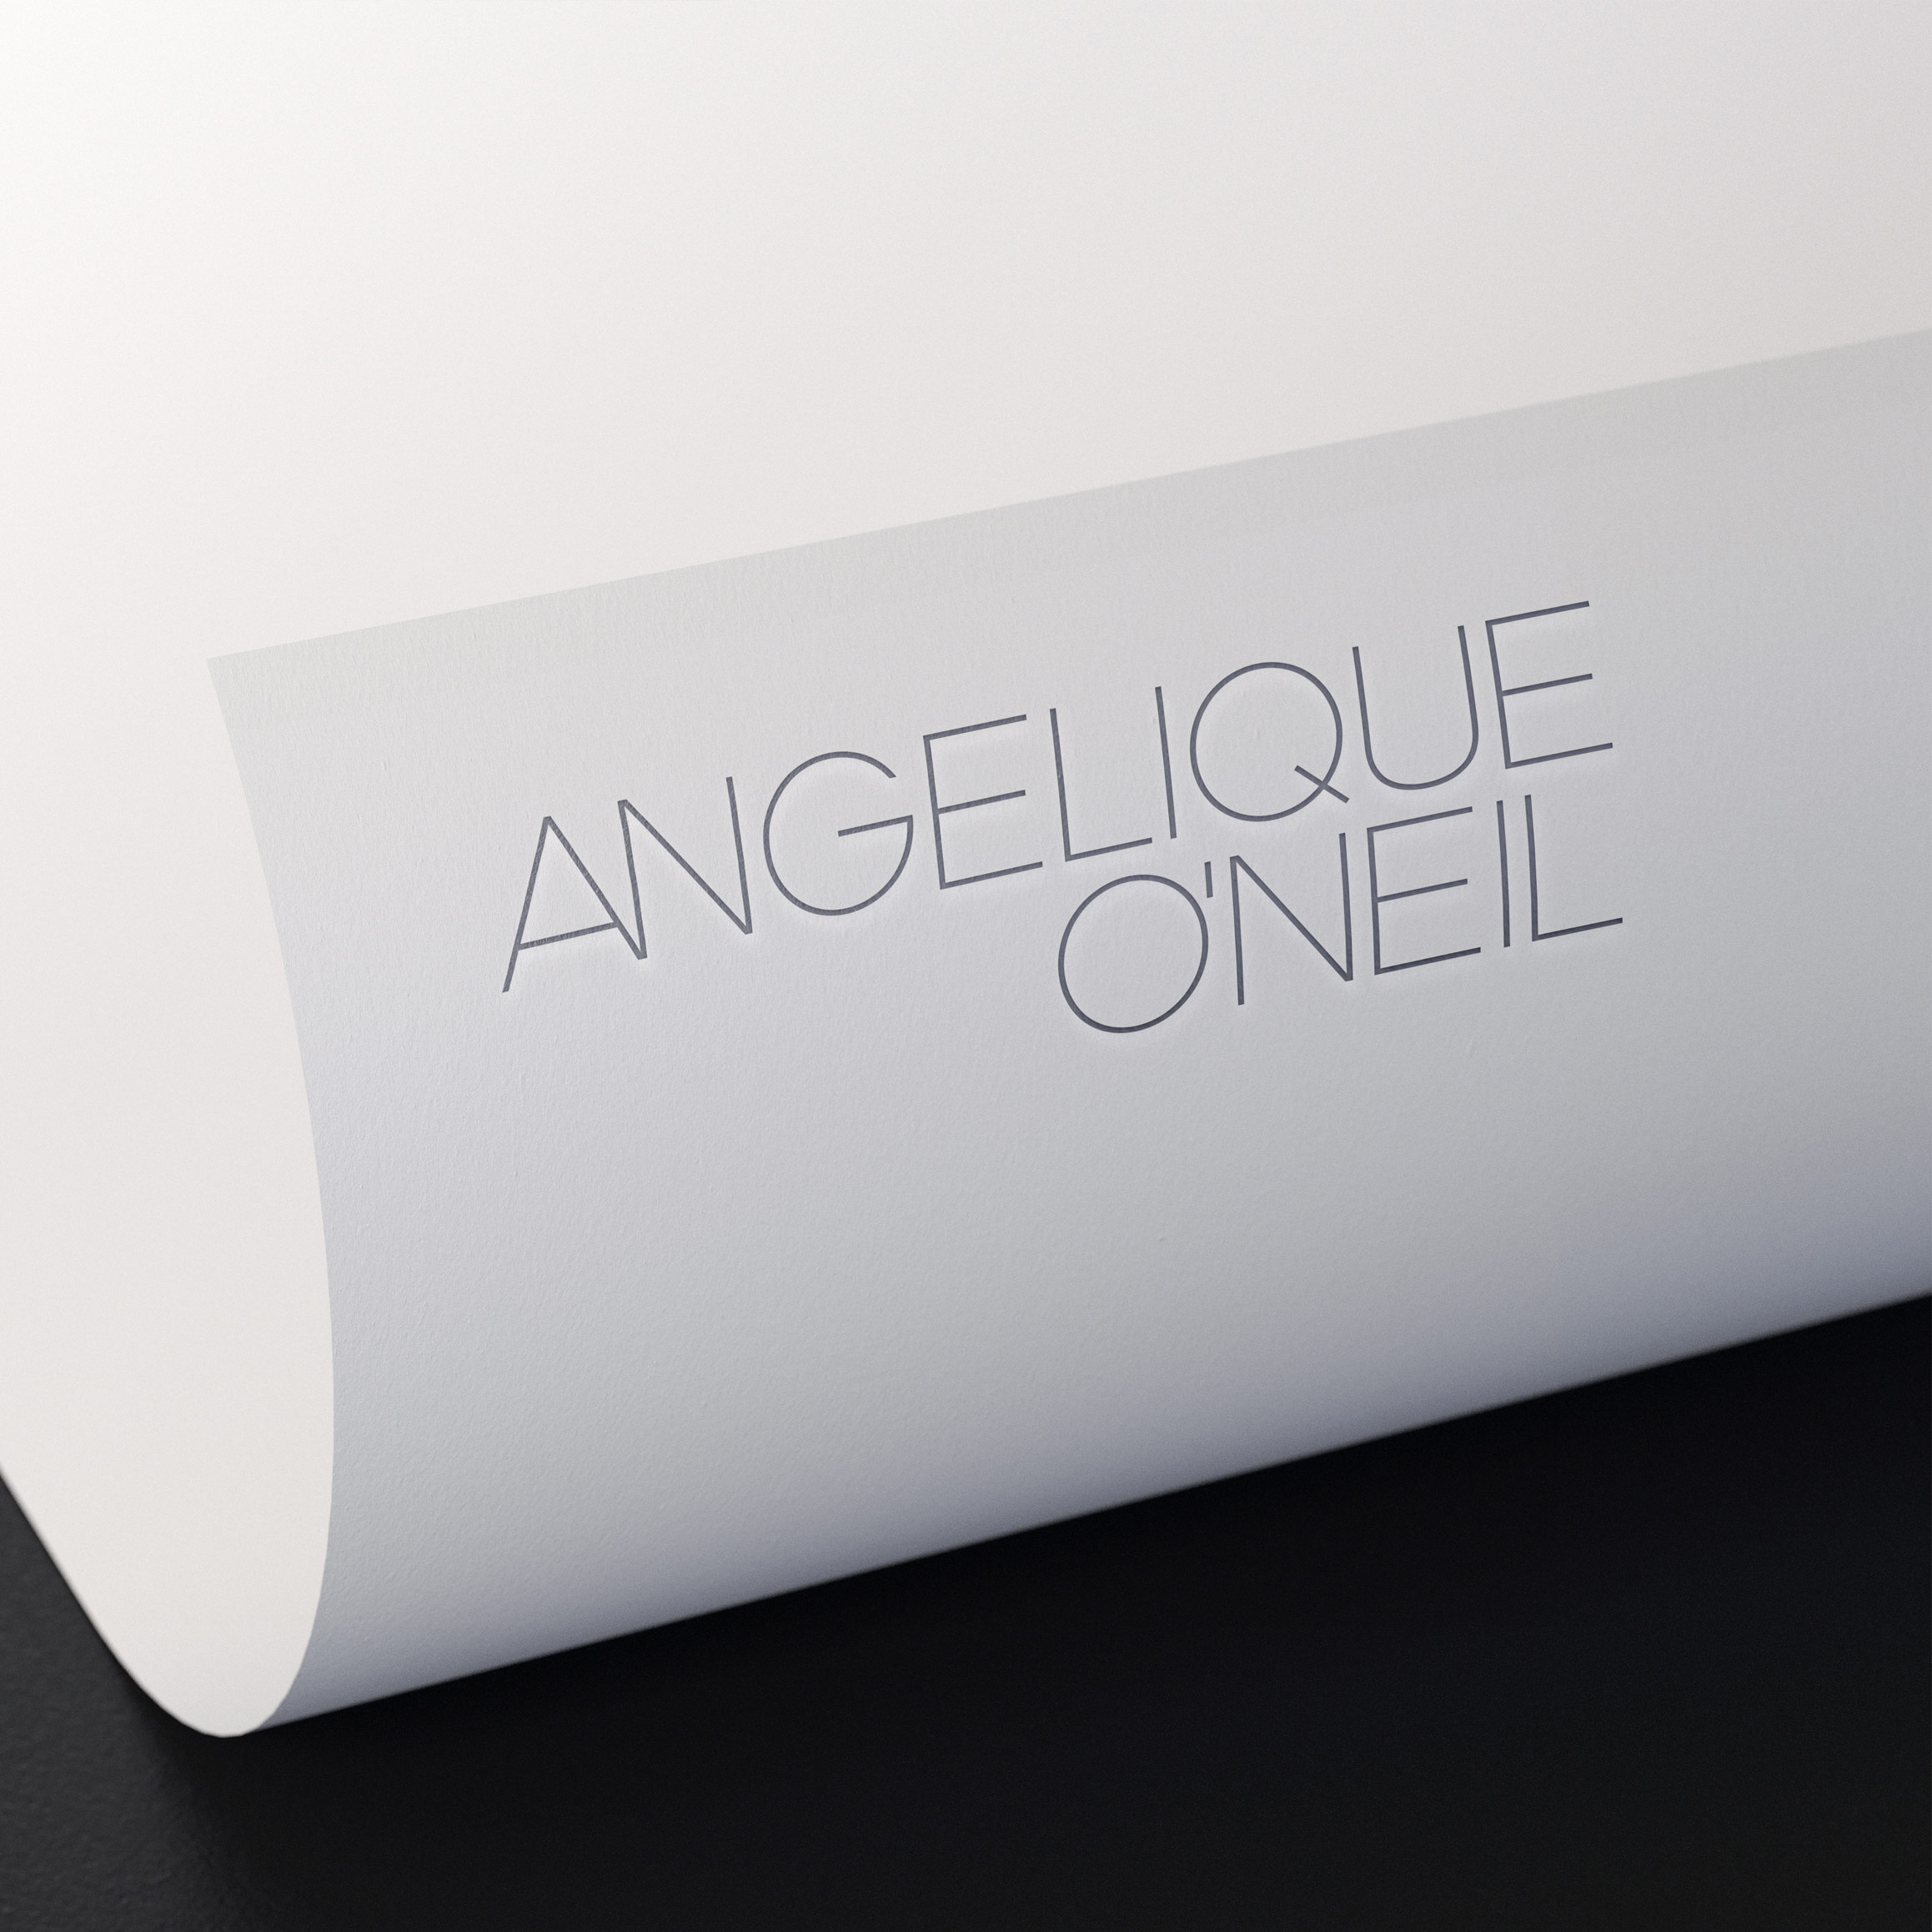 Angelique-Oneil-logo.jpg